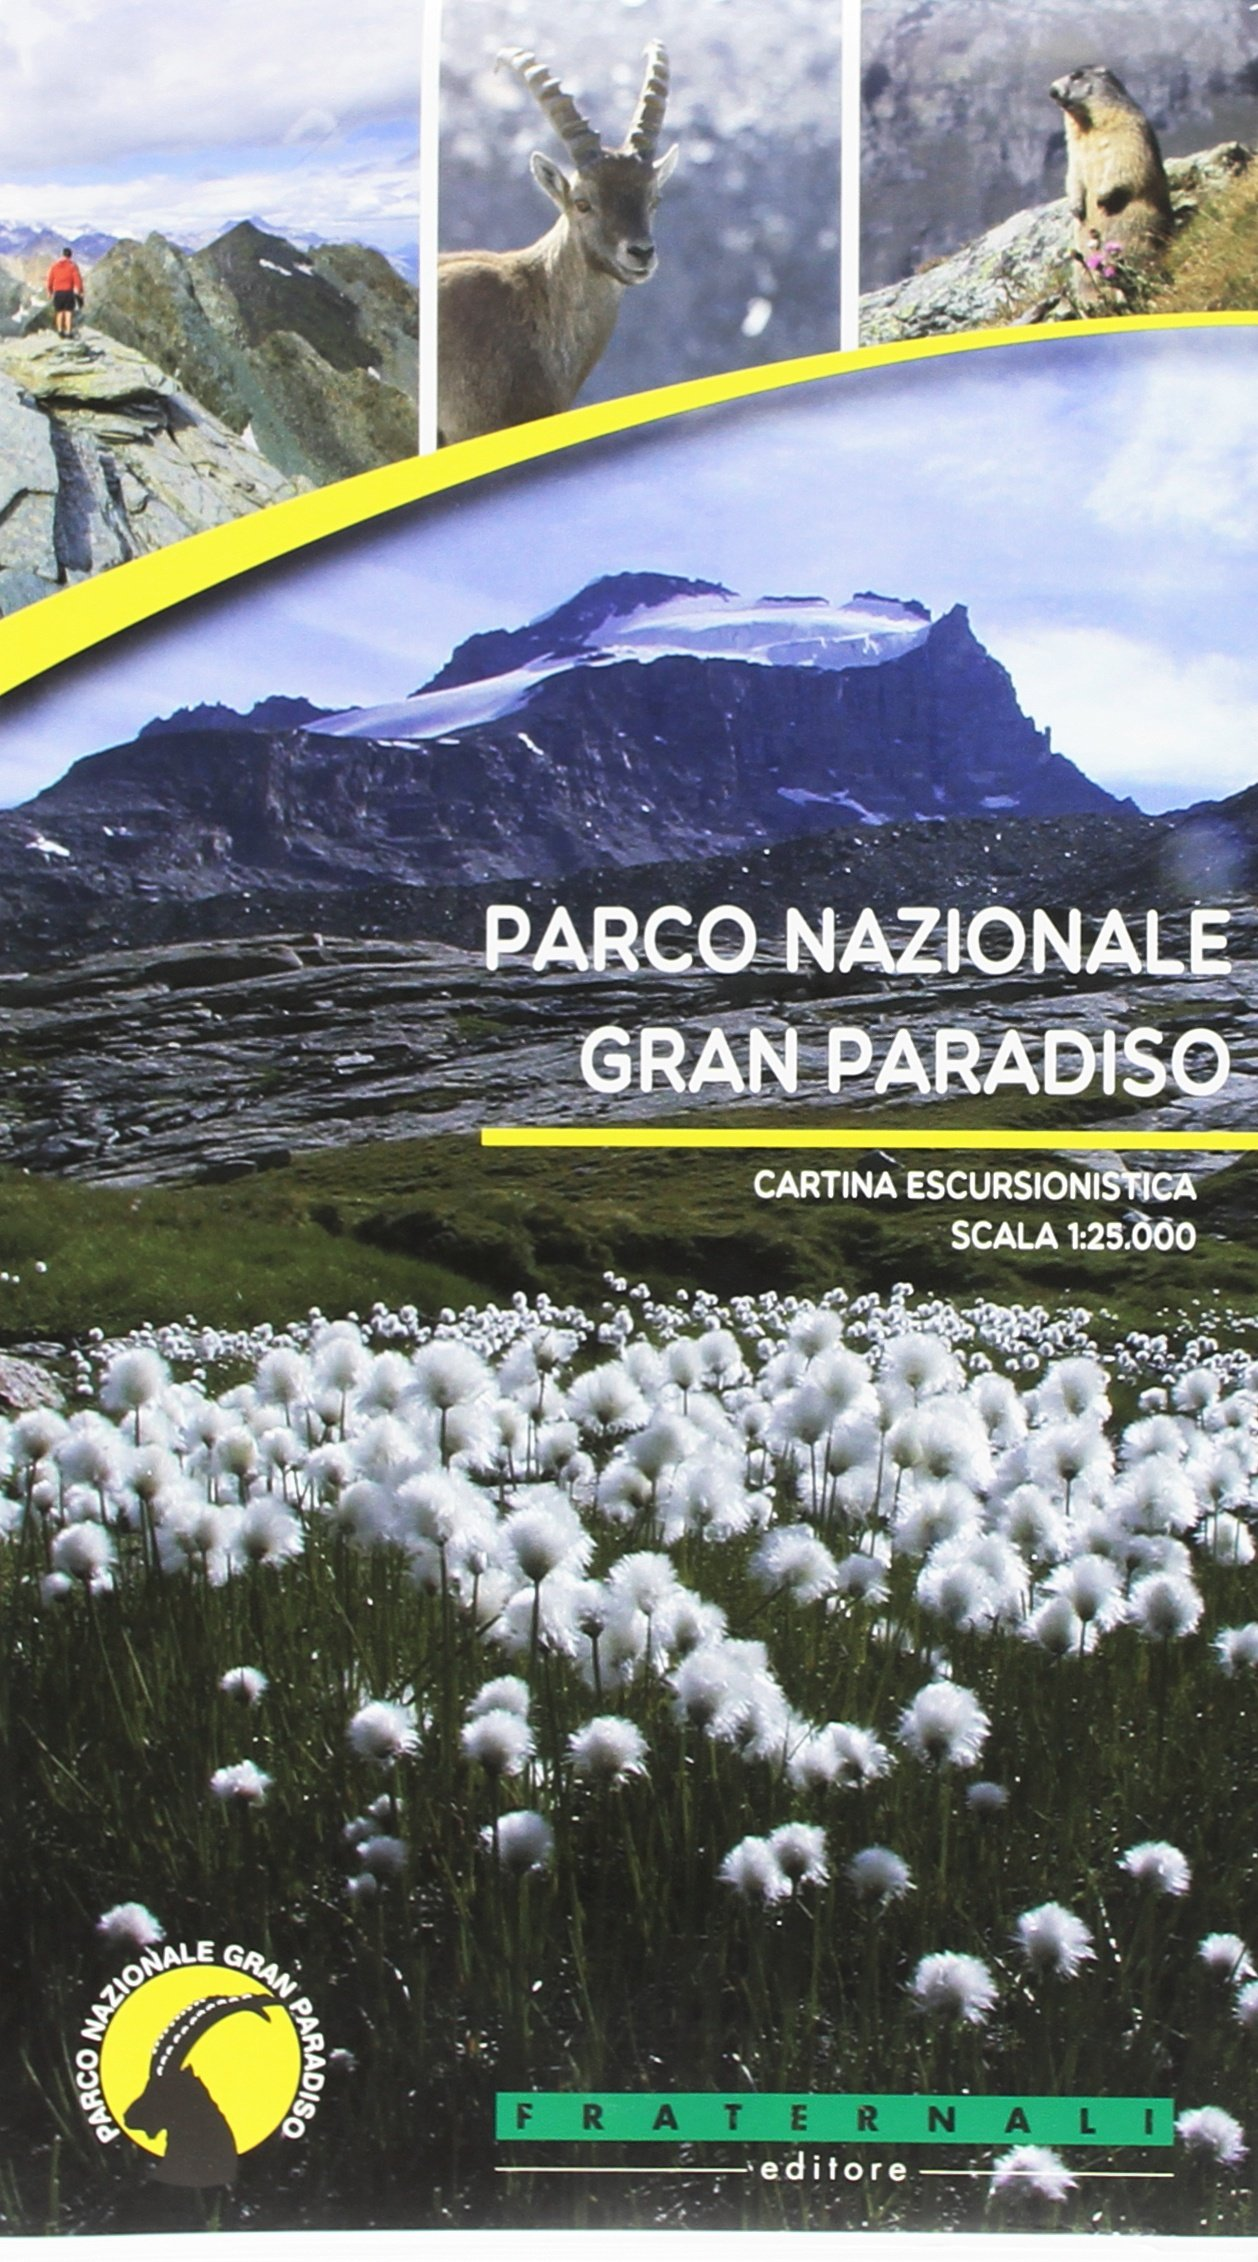 Parco Nazionale del Gran Paradiso | wandelkaart 1:25.000 9788897465454  Fraternali Editore   Wandelkaarten Aosta, Gran Paradiso